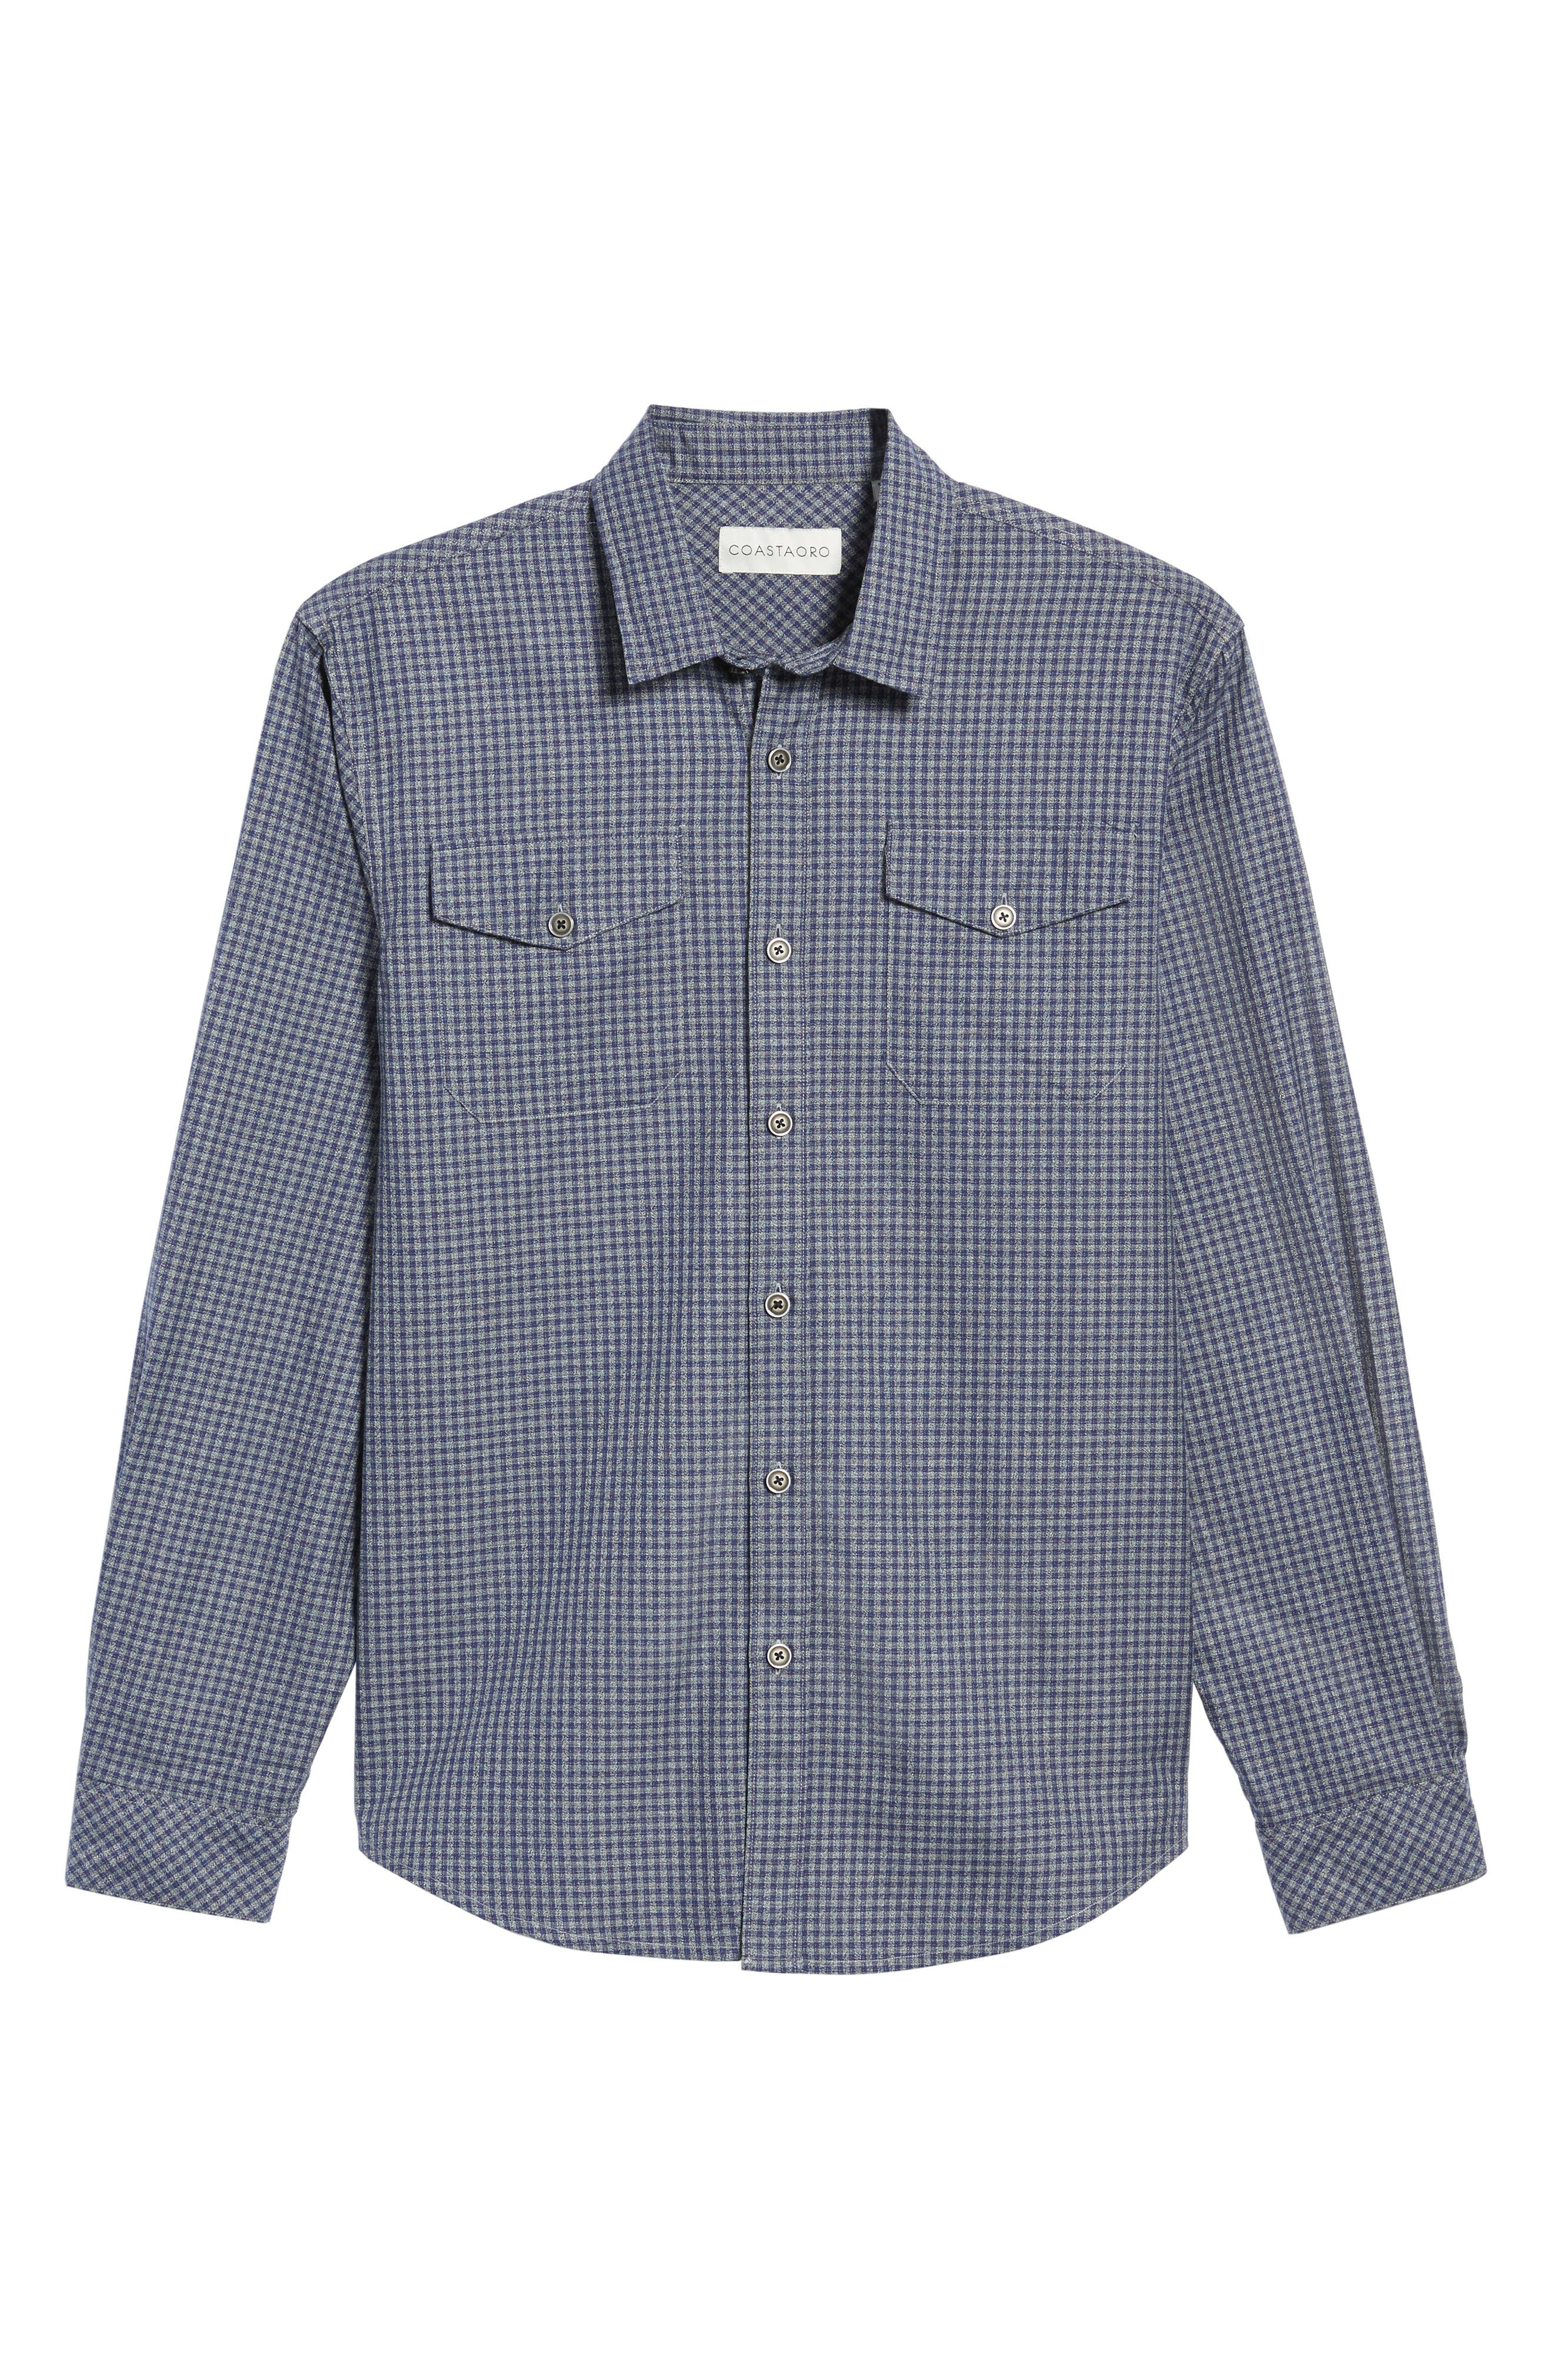 Main Street Check Flannel Shirt,                             Alternate thumbnail 6, color,                             405